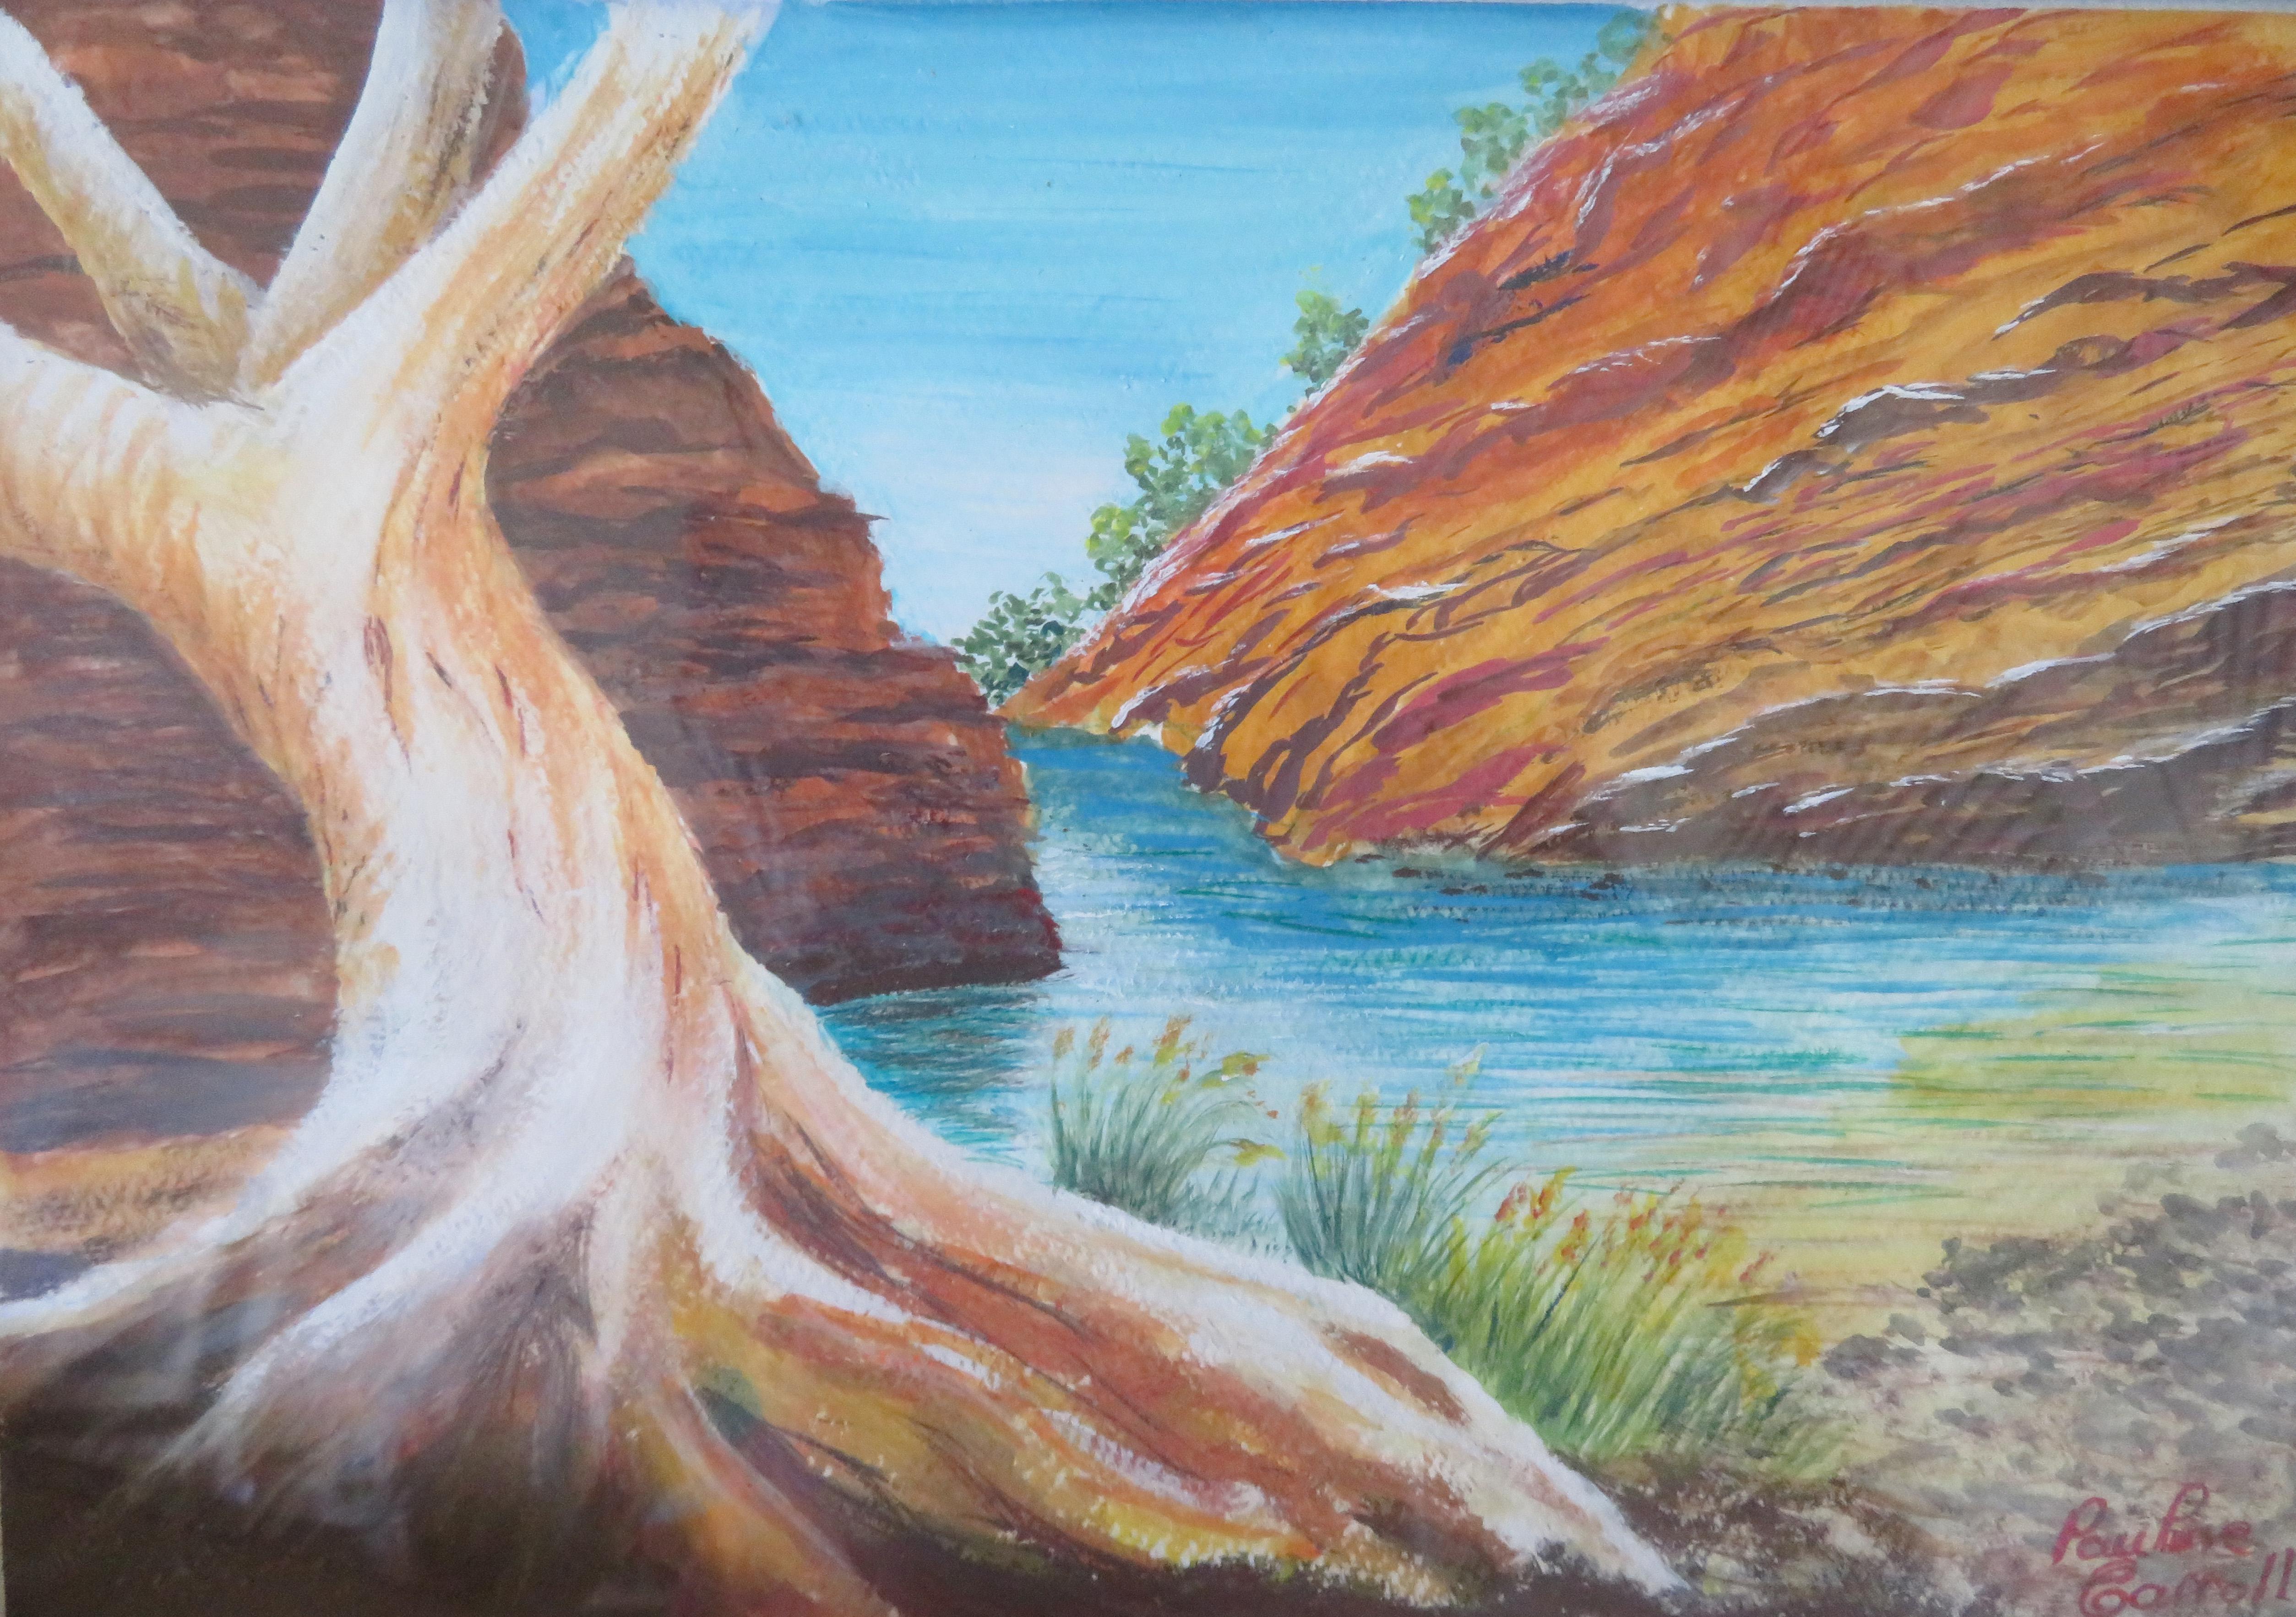 brown art 006_5014x3532